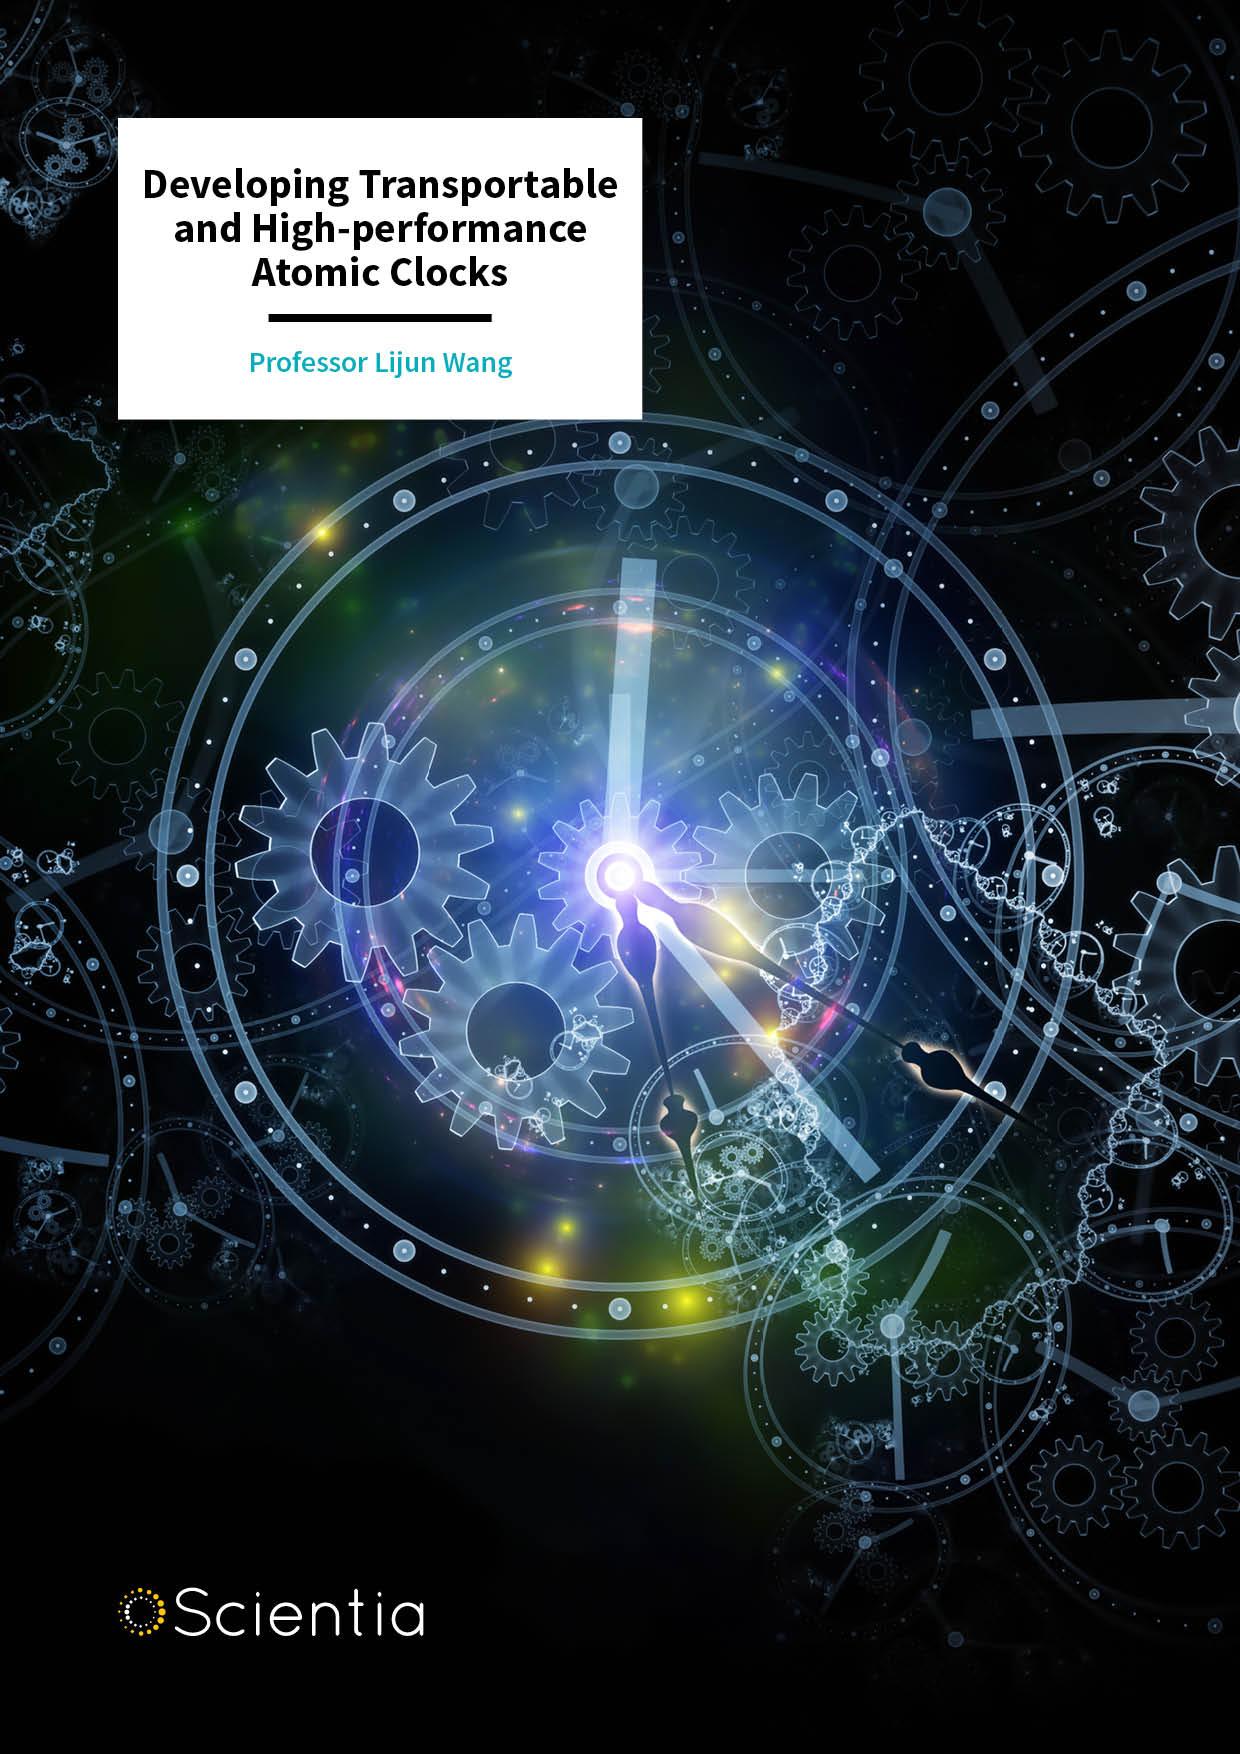 Professor Lijun Wang – Developing Transportable and High-performance Atomic Clocks